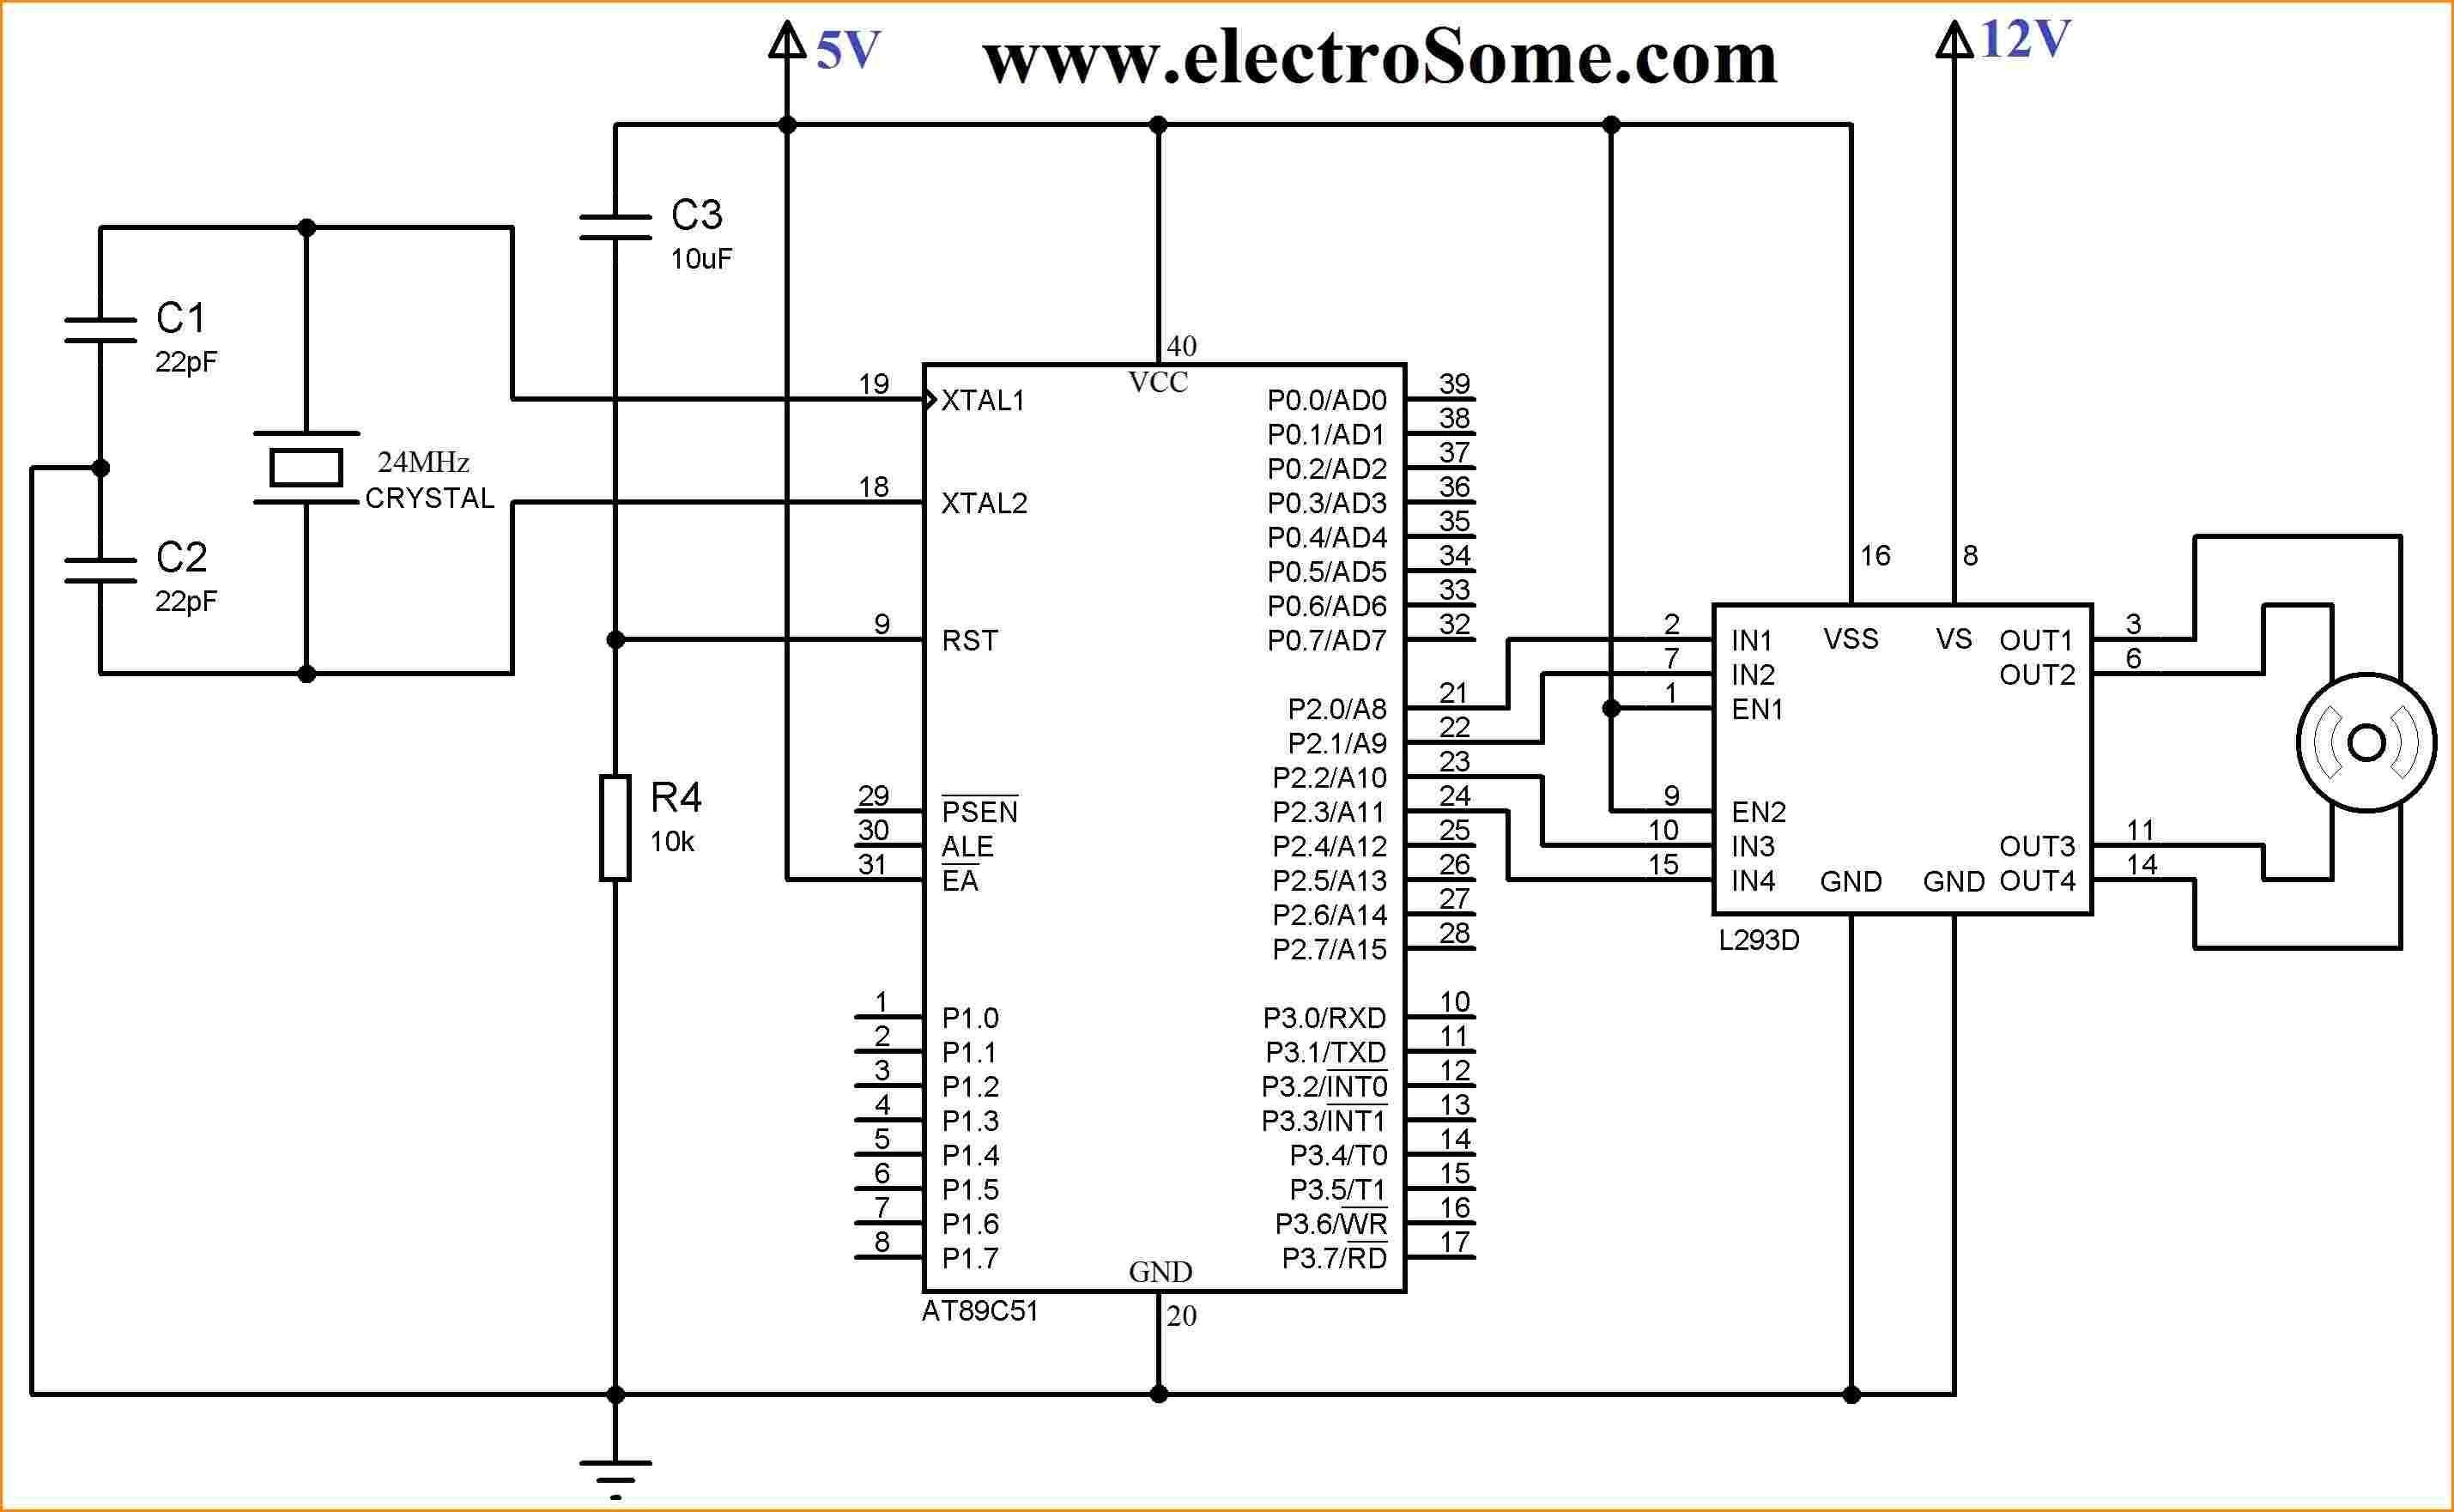 Mac Valve Wiring Diagram New Security Camera Wiring Diagram Elegant